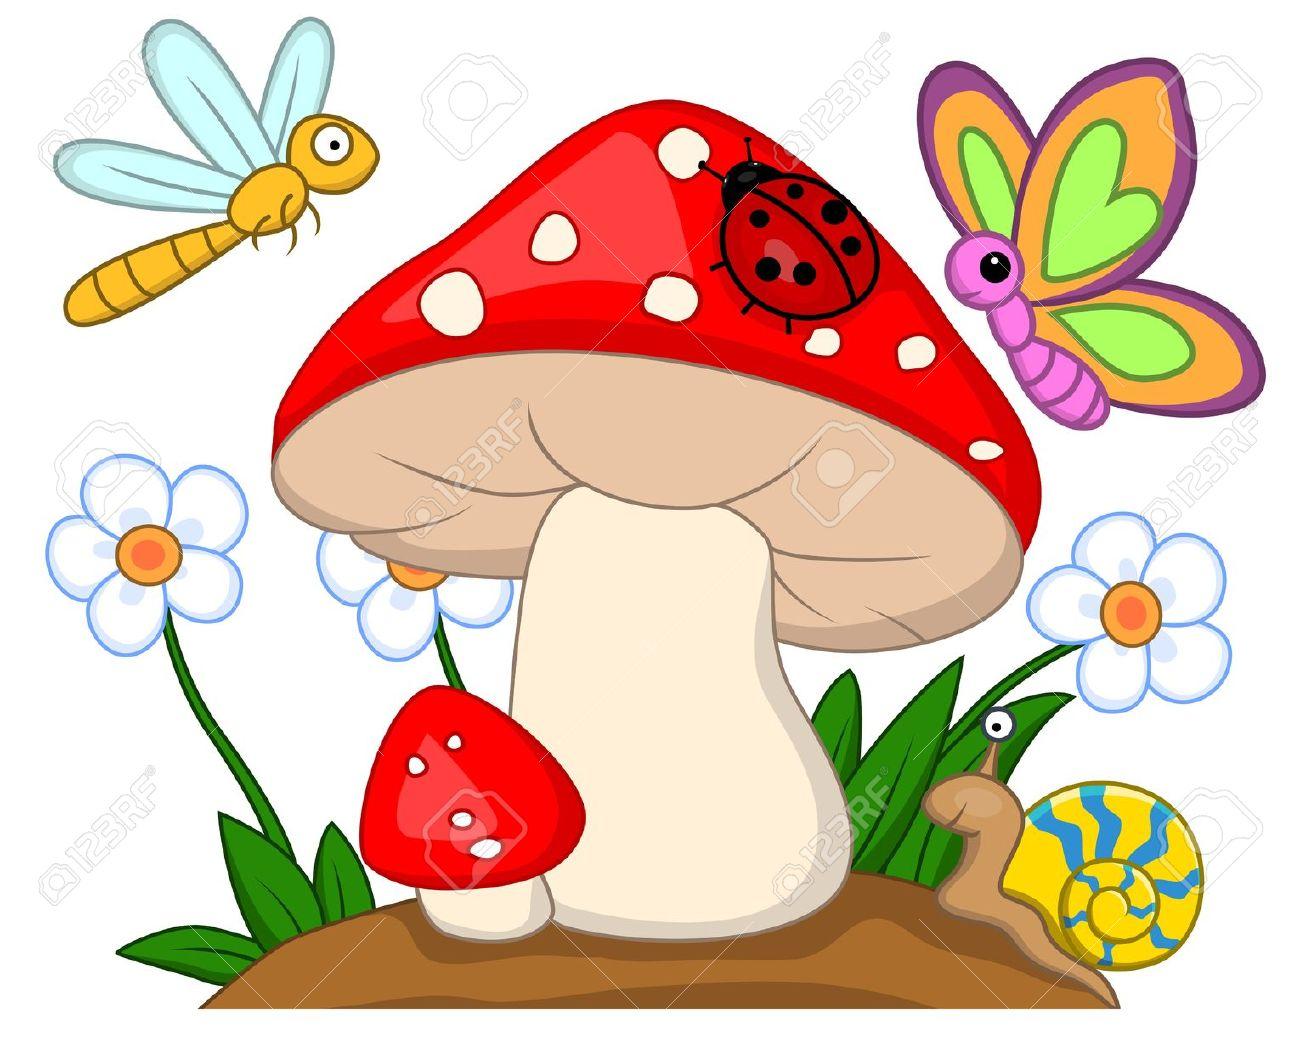 Mushrooms clipart cartoon. Mushroom free download best